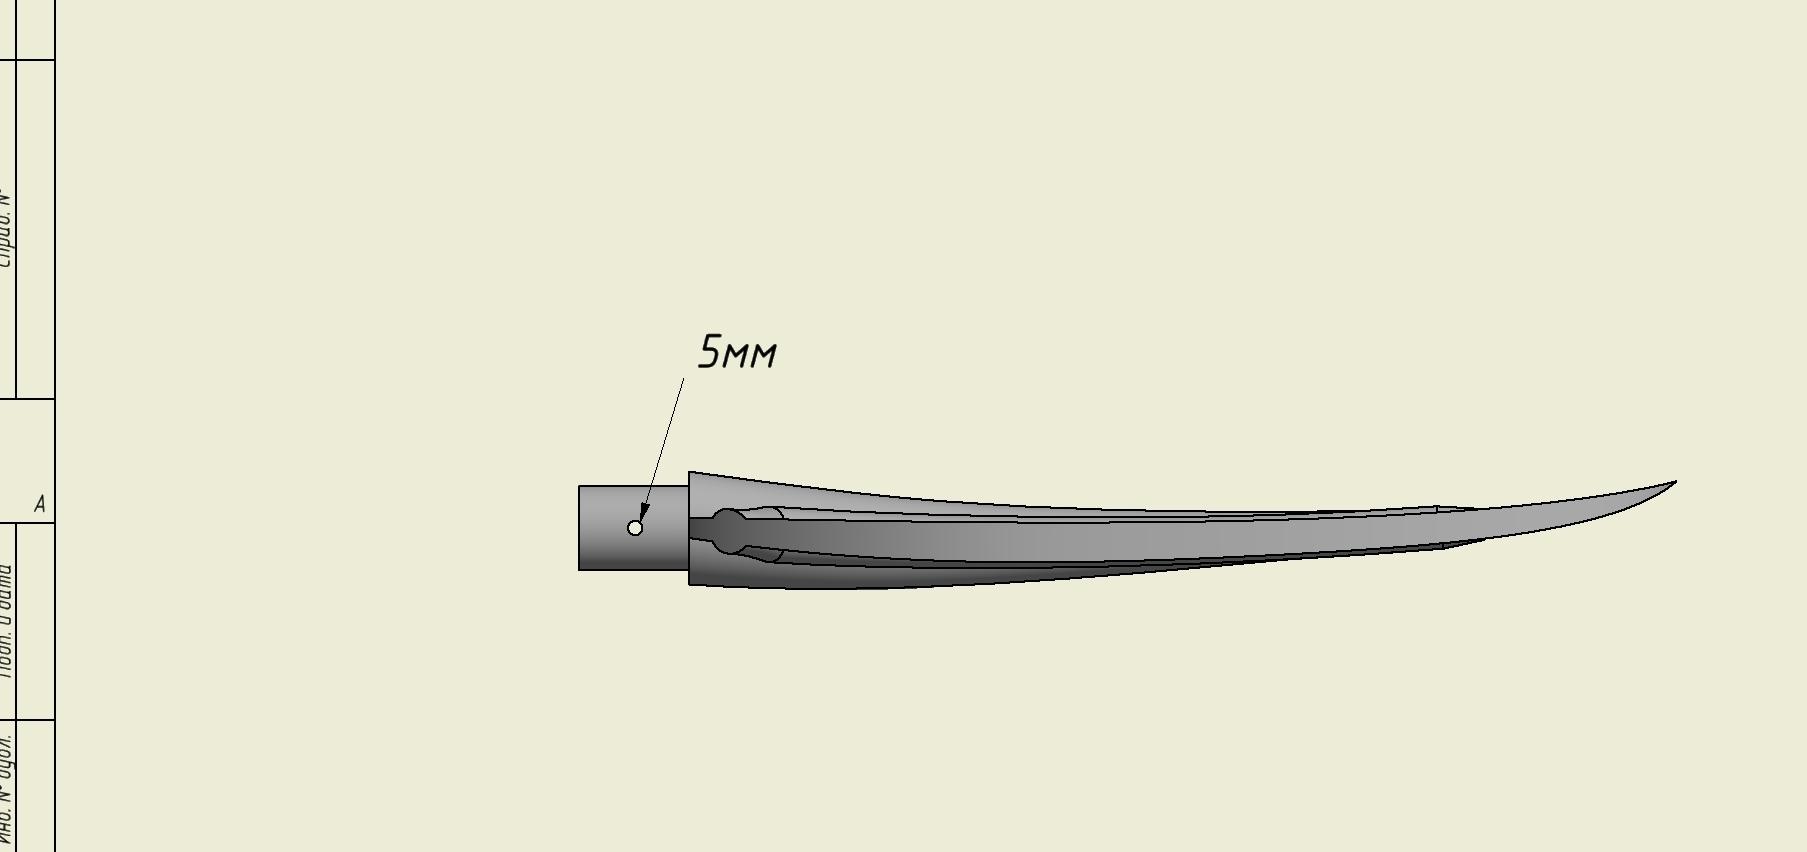 4444.jpg Download free STL file Paddle/Весло • 3D printing design, MaKs